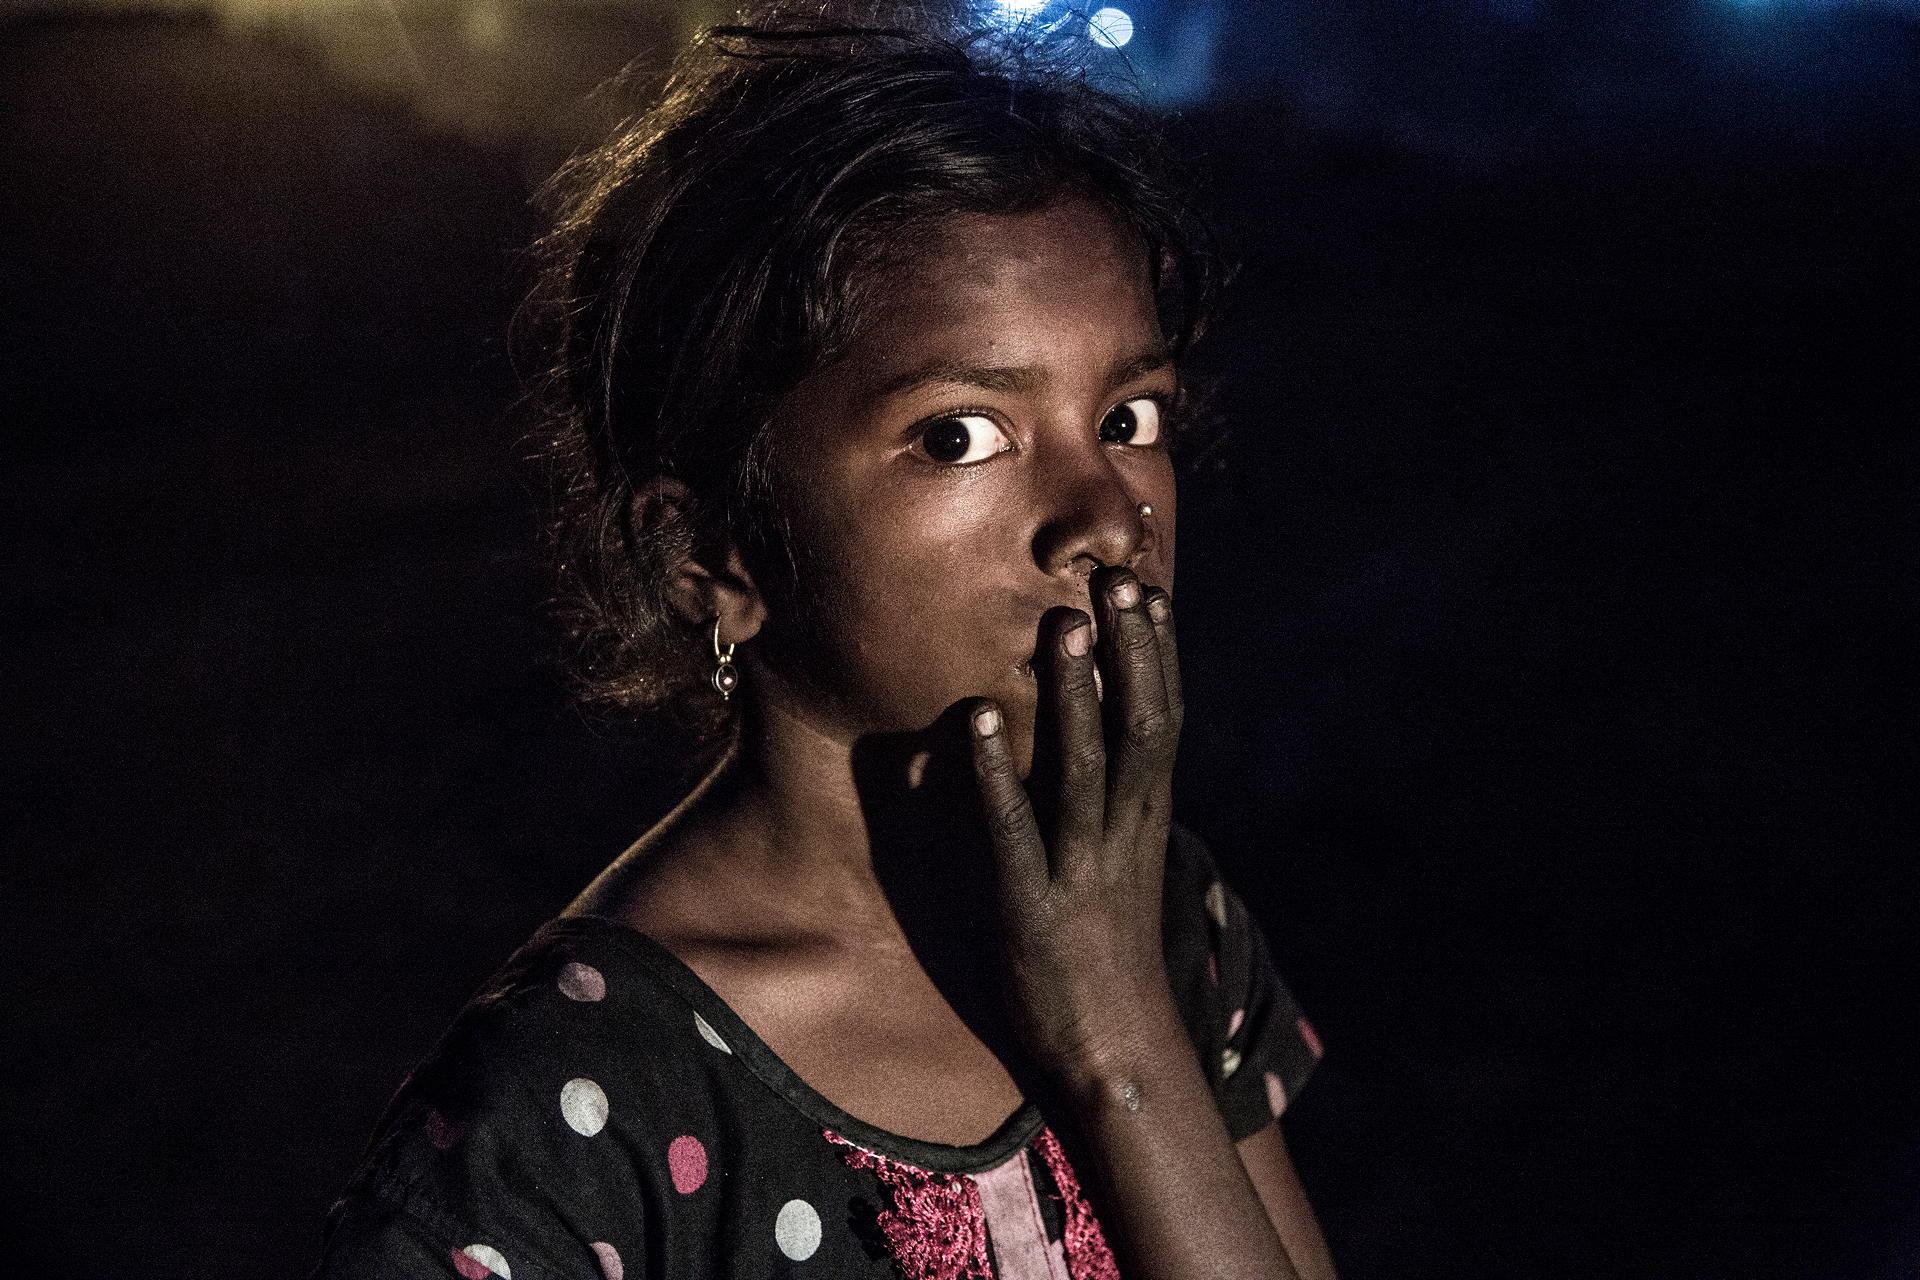 Supratim Bhattacharjee - The Curse Of Coal - Felix Schoeller Photoaward